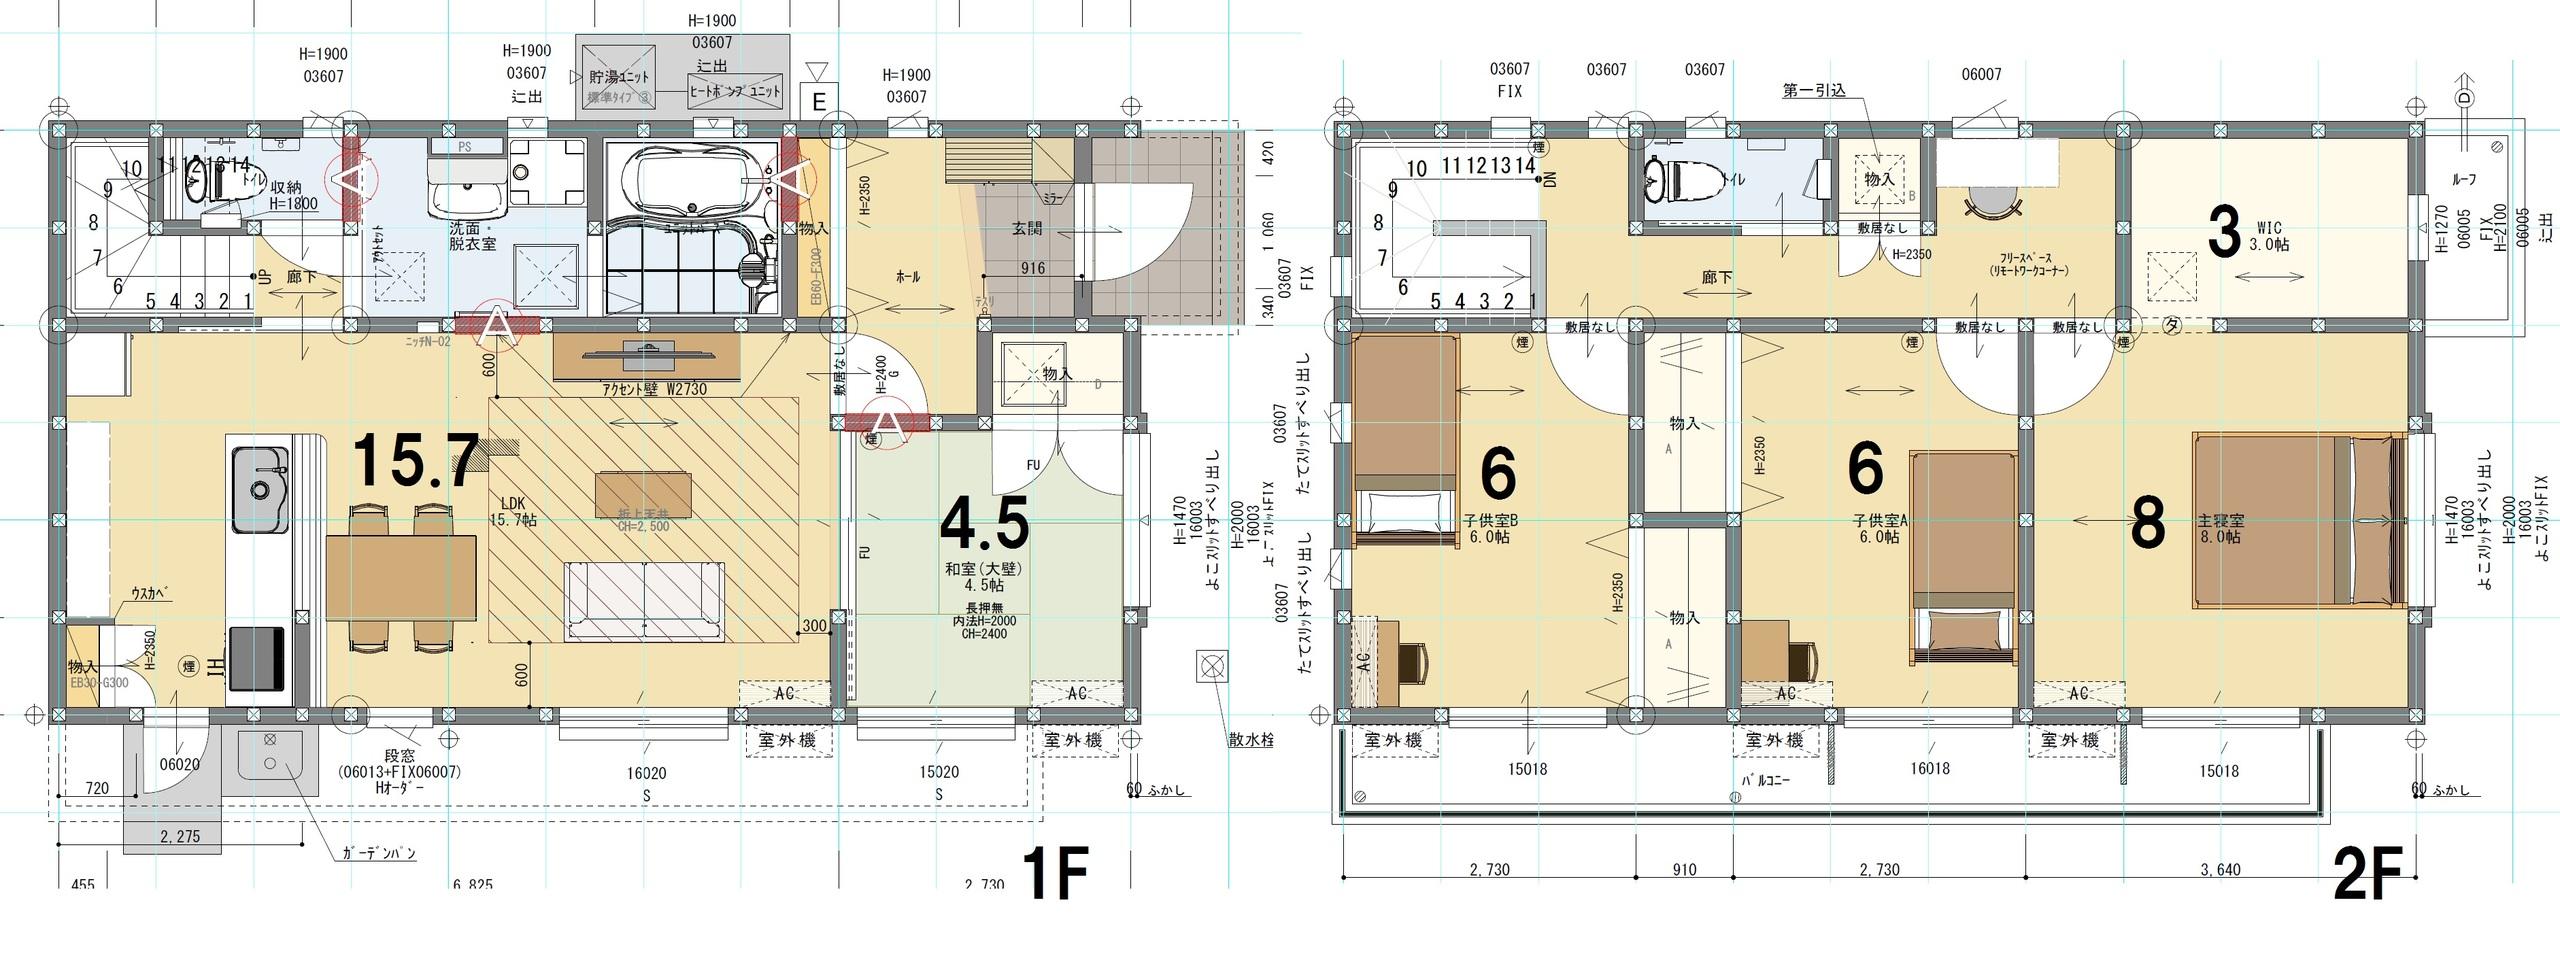 C棟 4LDK+S 土地面積246.81㎡ 建物面積108.47㎡